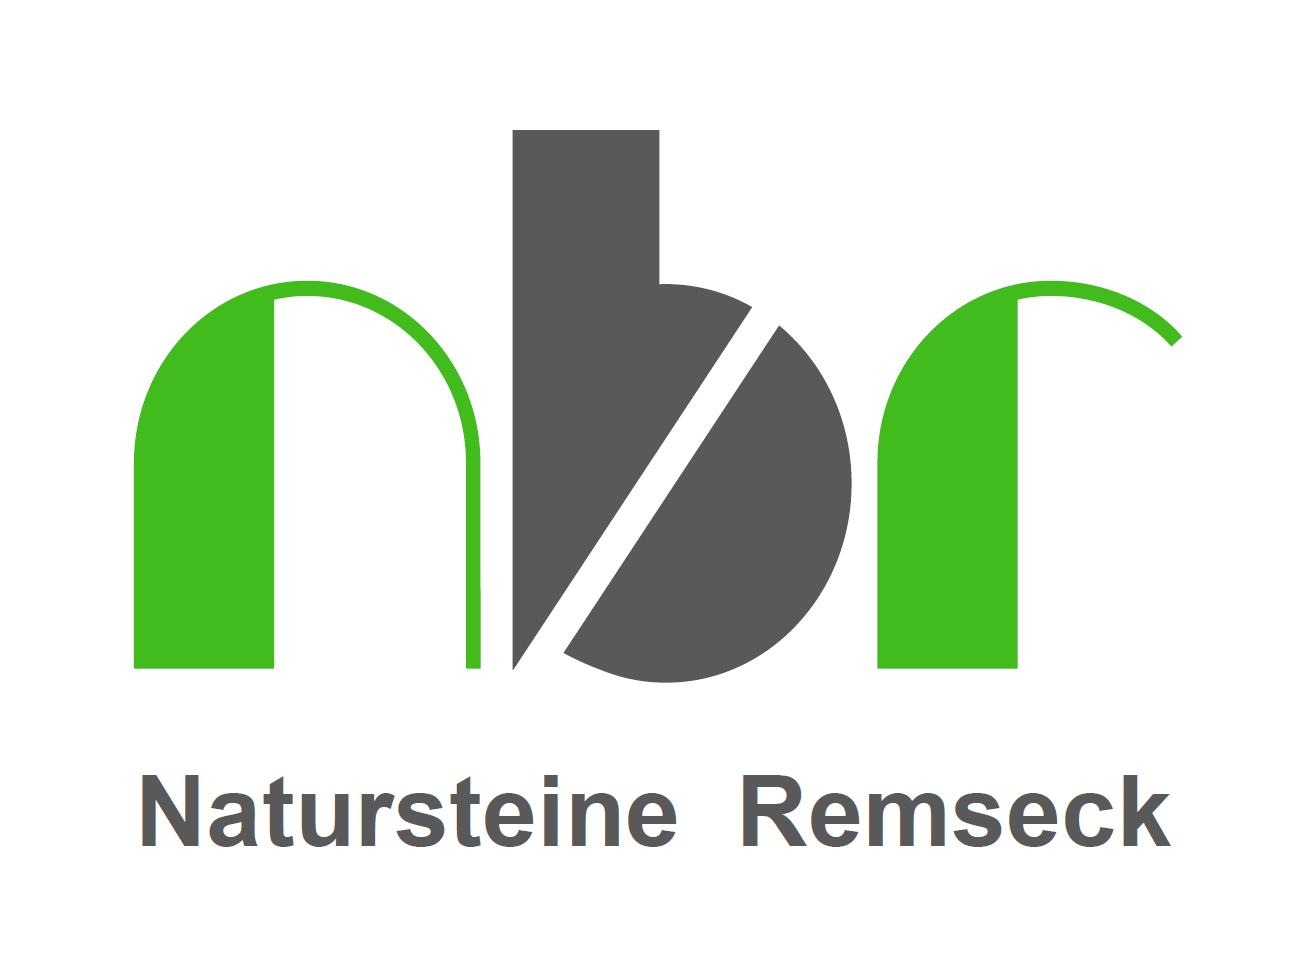 nbr GmbH & Co. KG